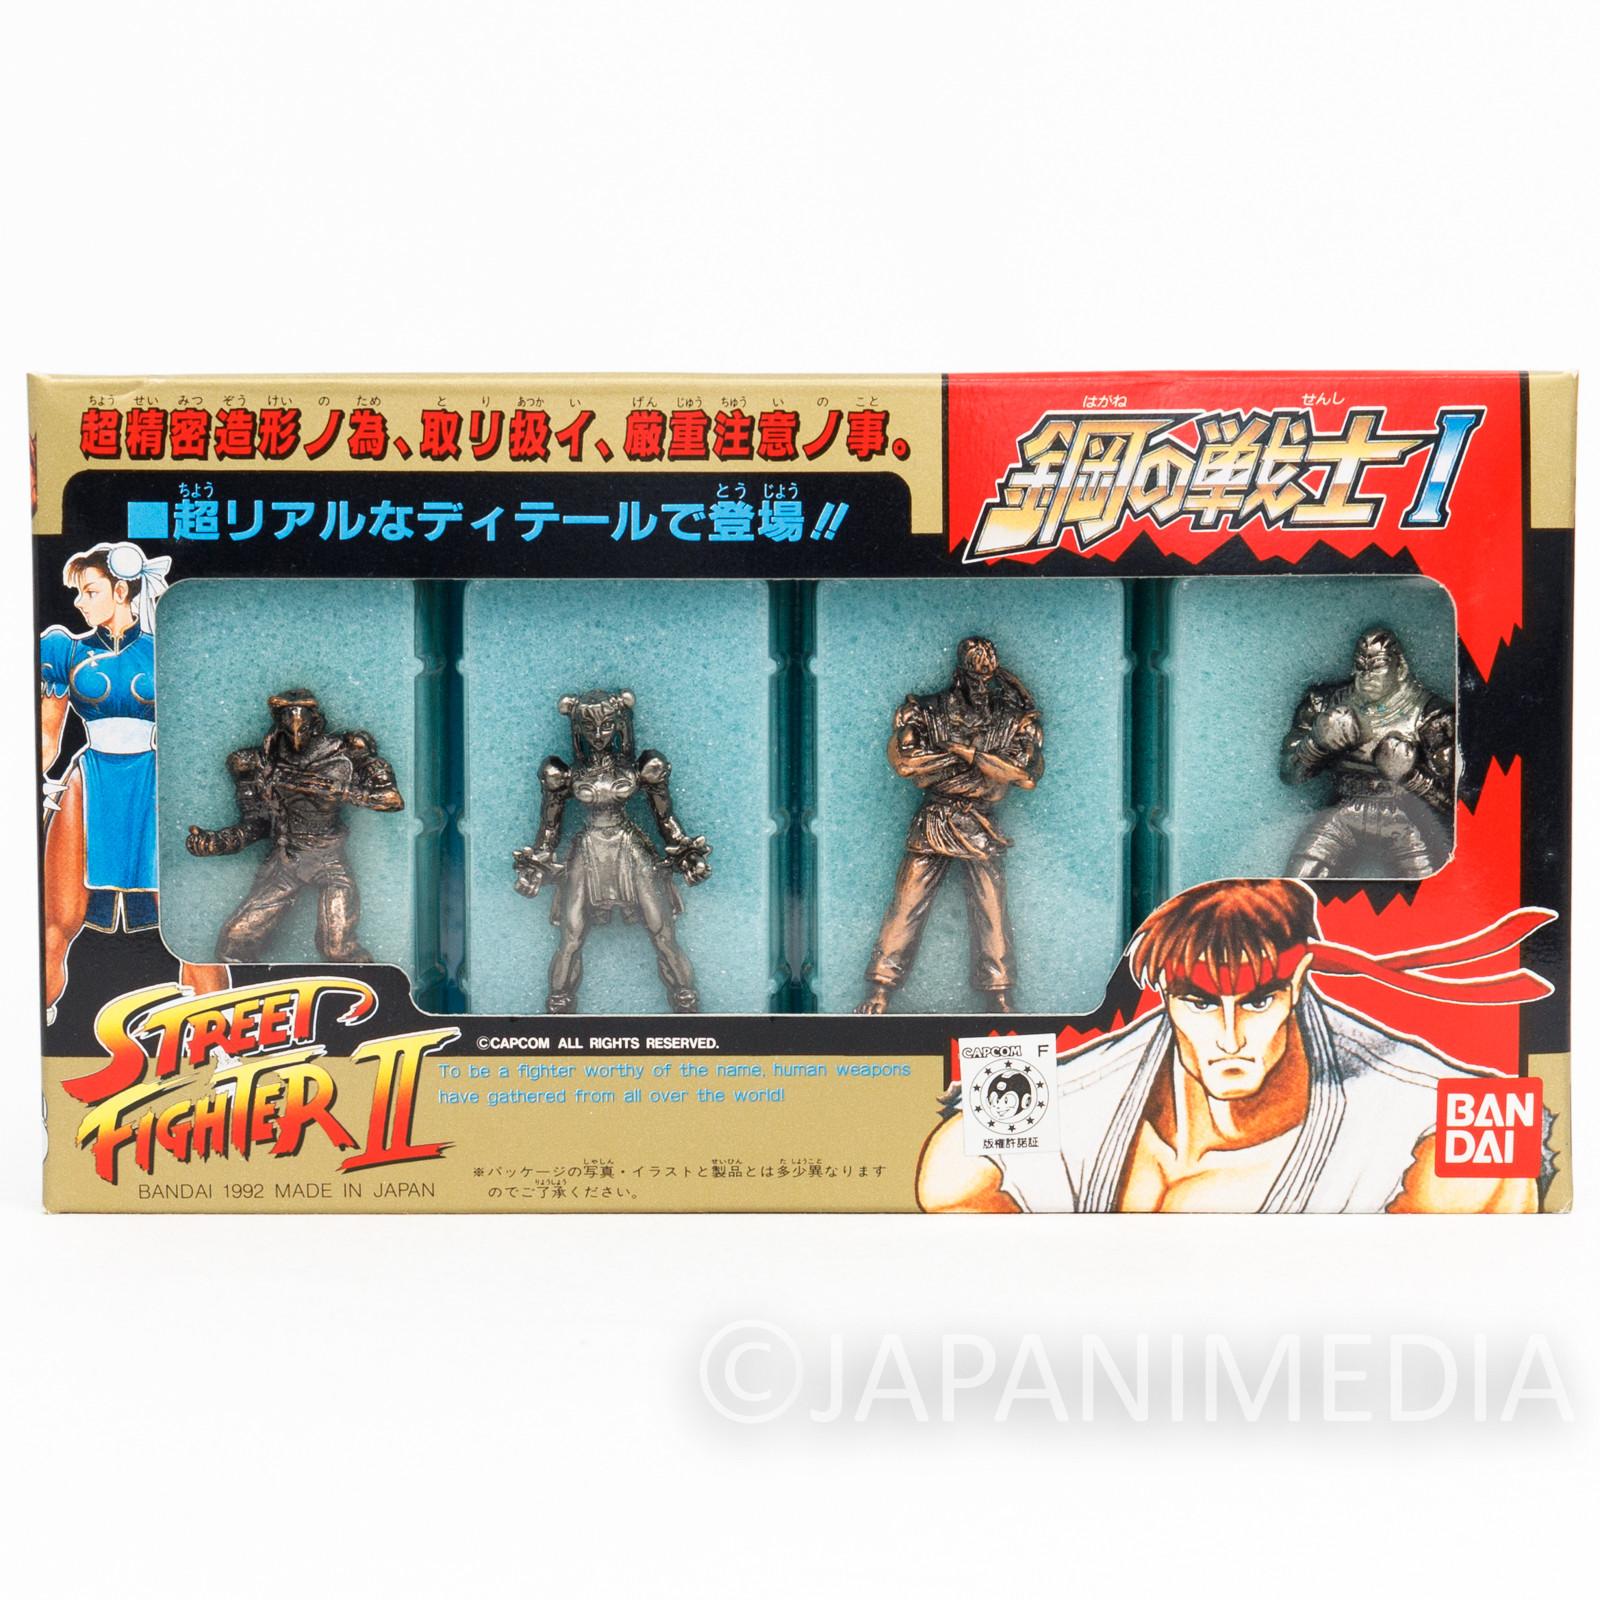 Retro Street Fighter 2 Metal Figure 4ps Set #1 Chun-Li Ryu Vega Balrog CAPCOM